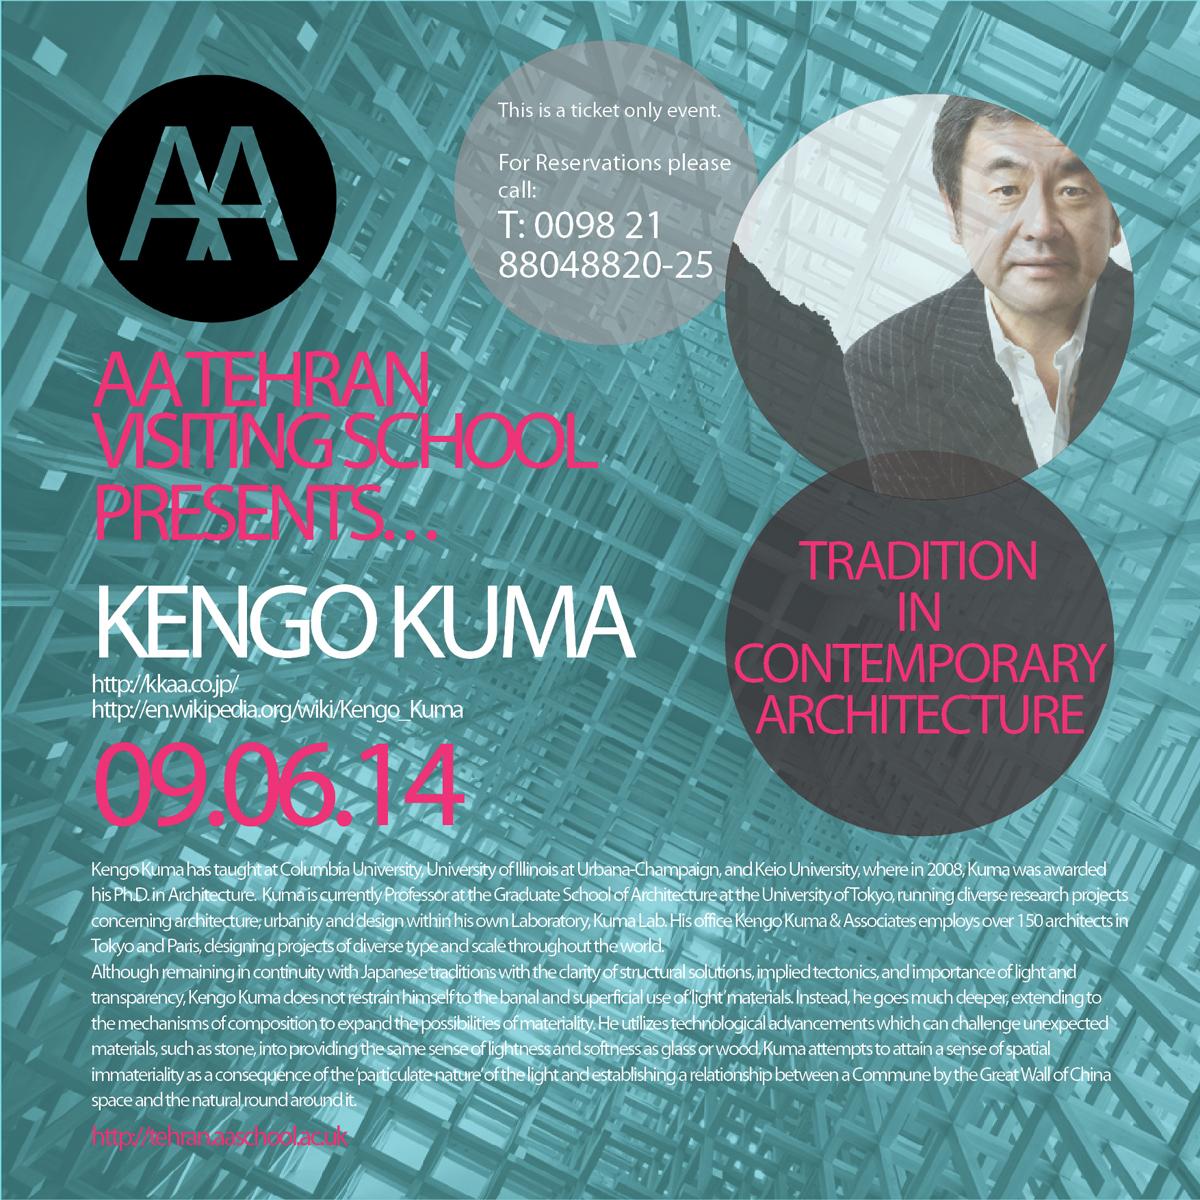 AA Tehran VS – Kengo Kuma – Lecture Series